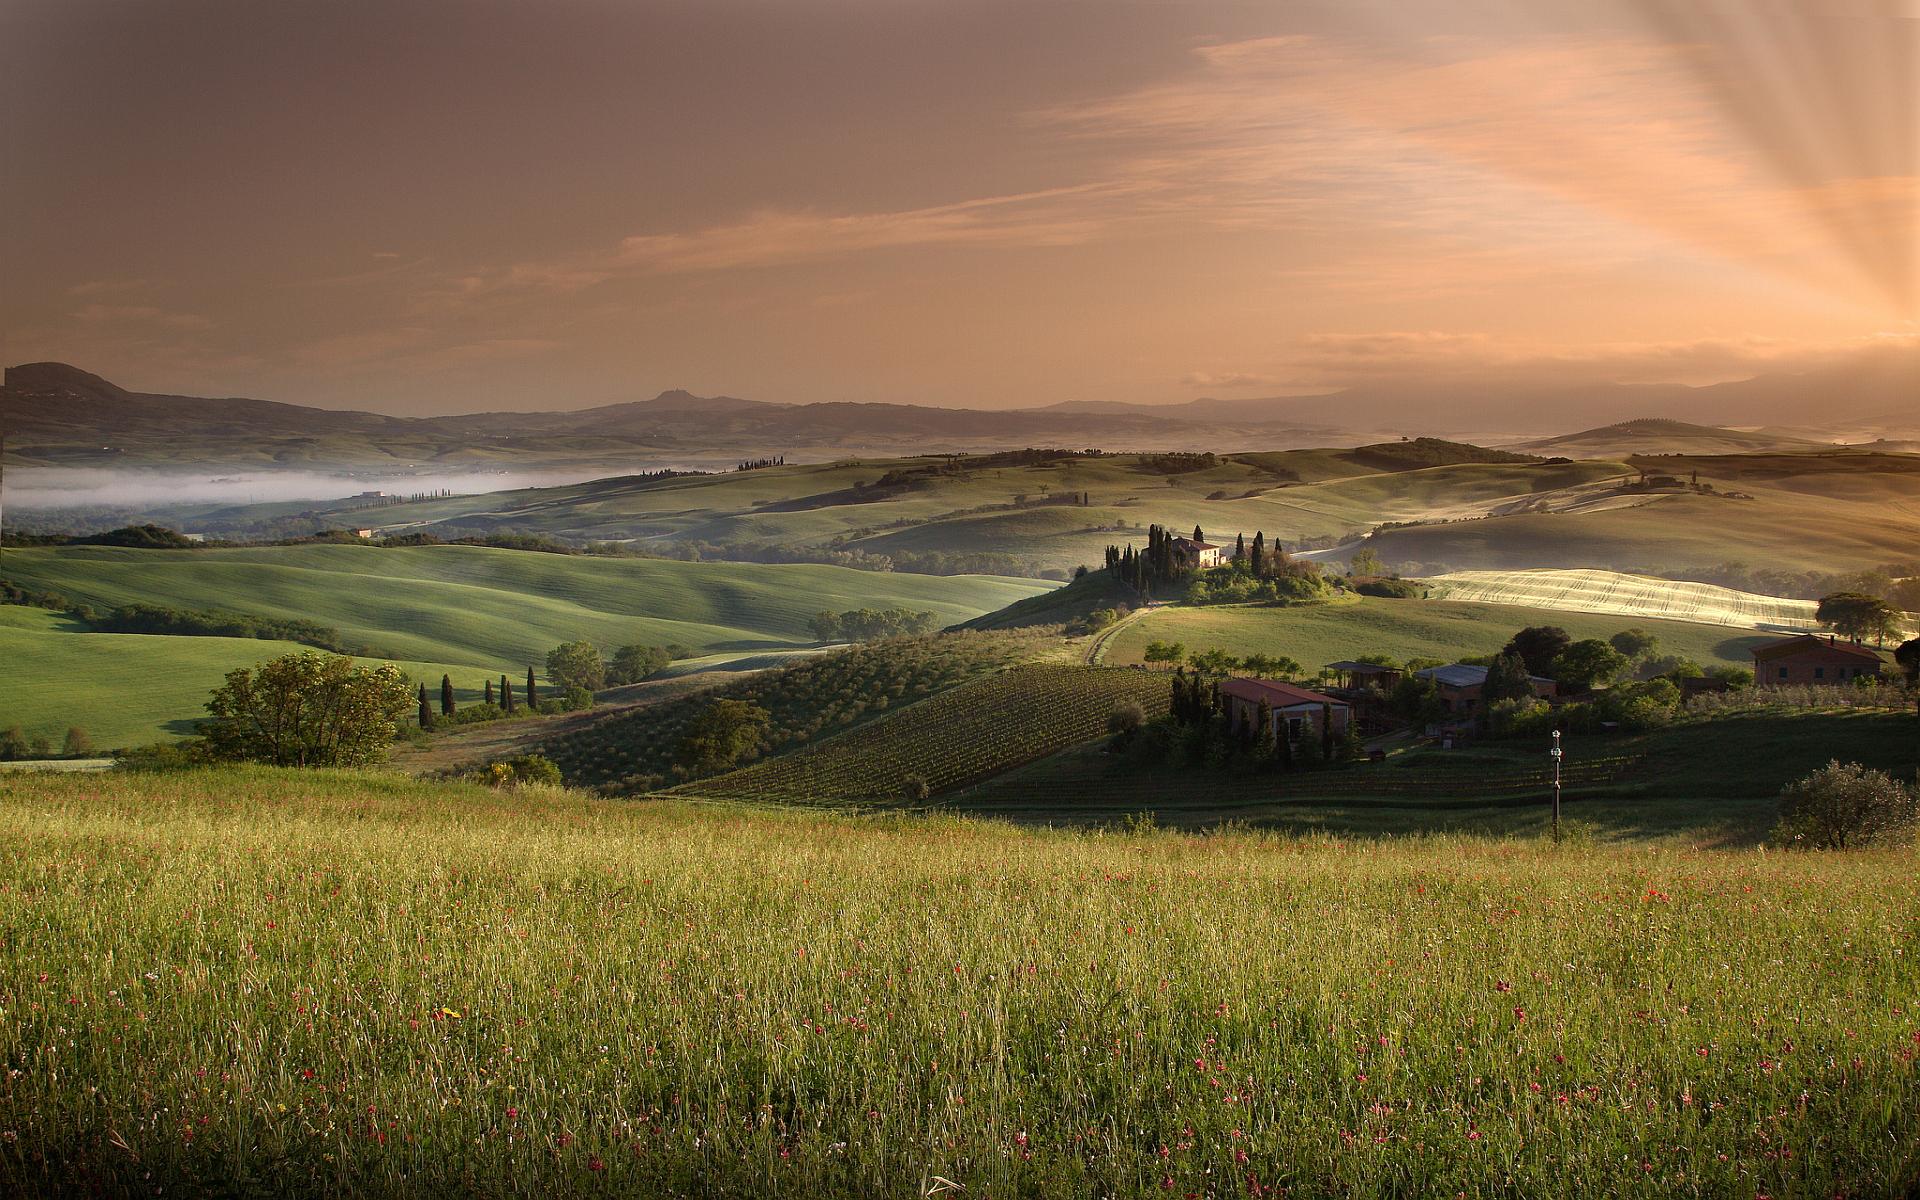 Flower Images 3d Wallpapers Marvelous Scenery Of Tuscany Italy T K Pradeep Shetty